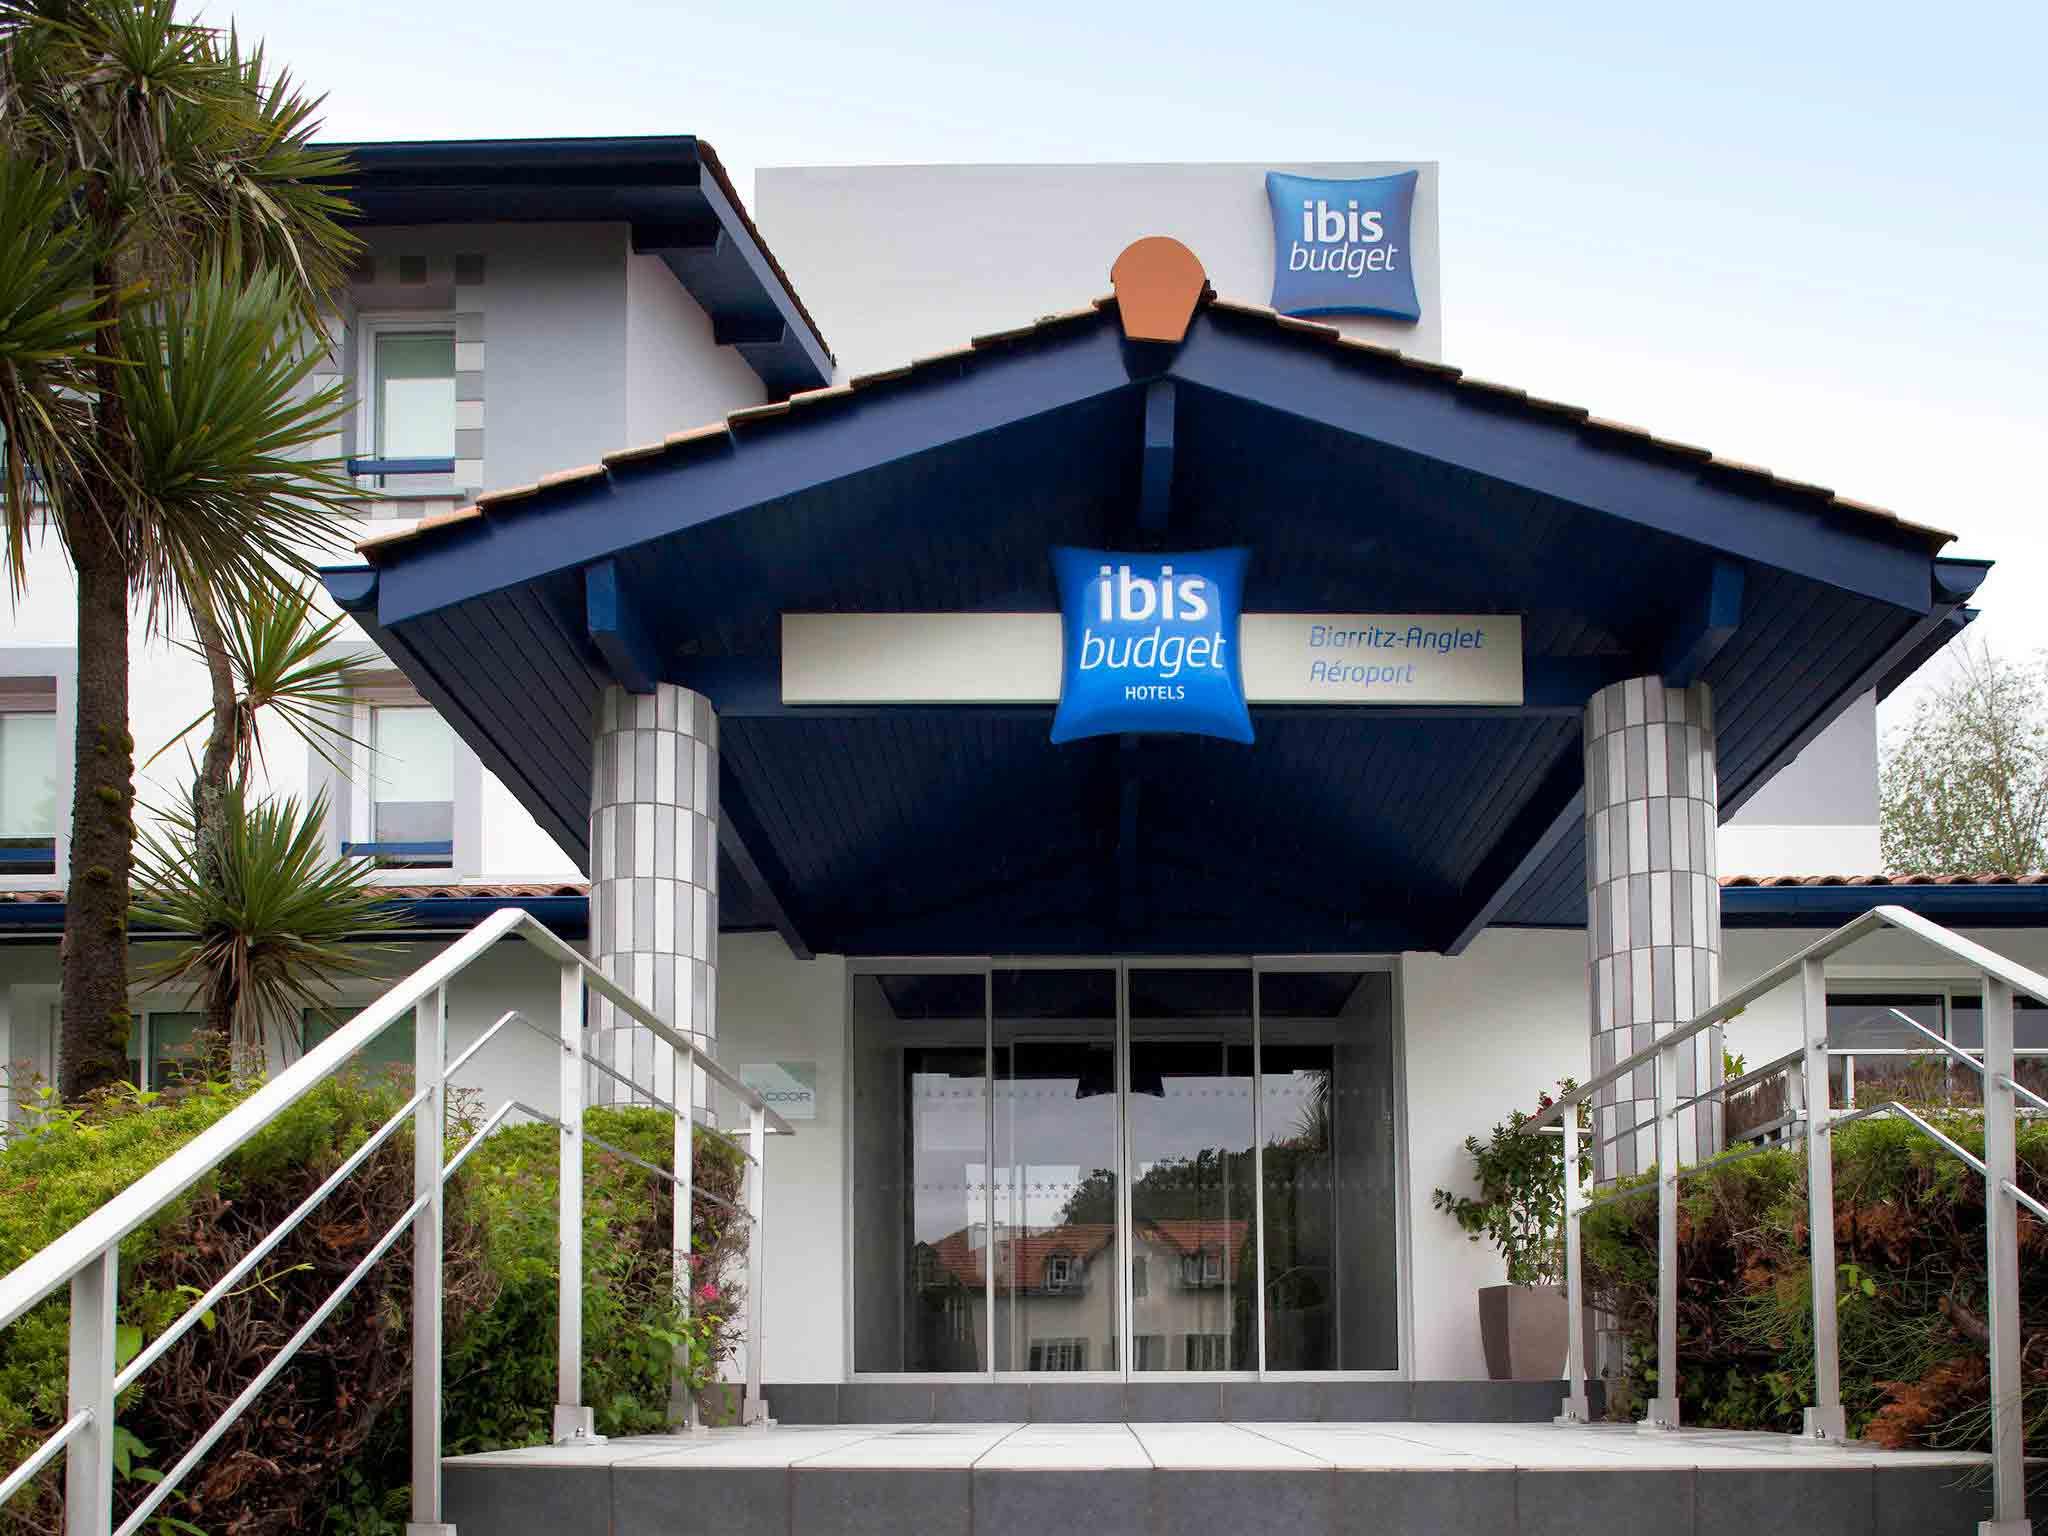 Hotel – ibis budget Biarritz Anglet